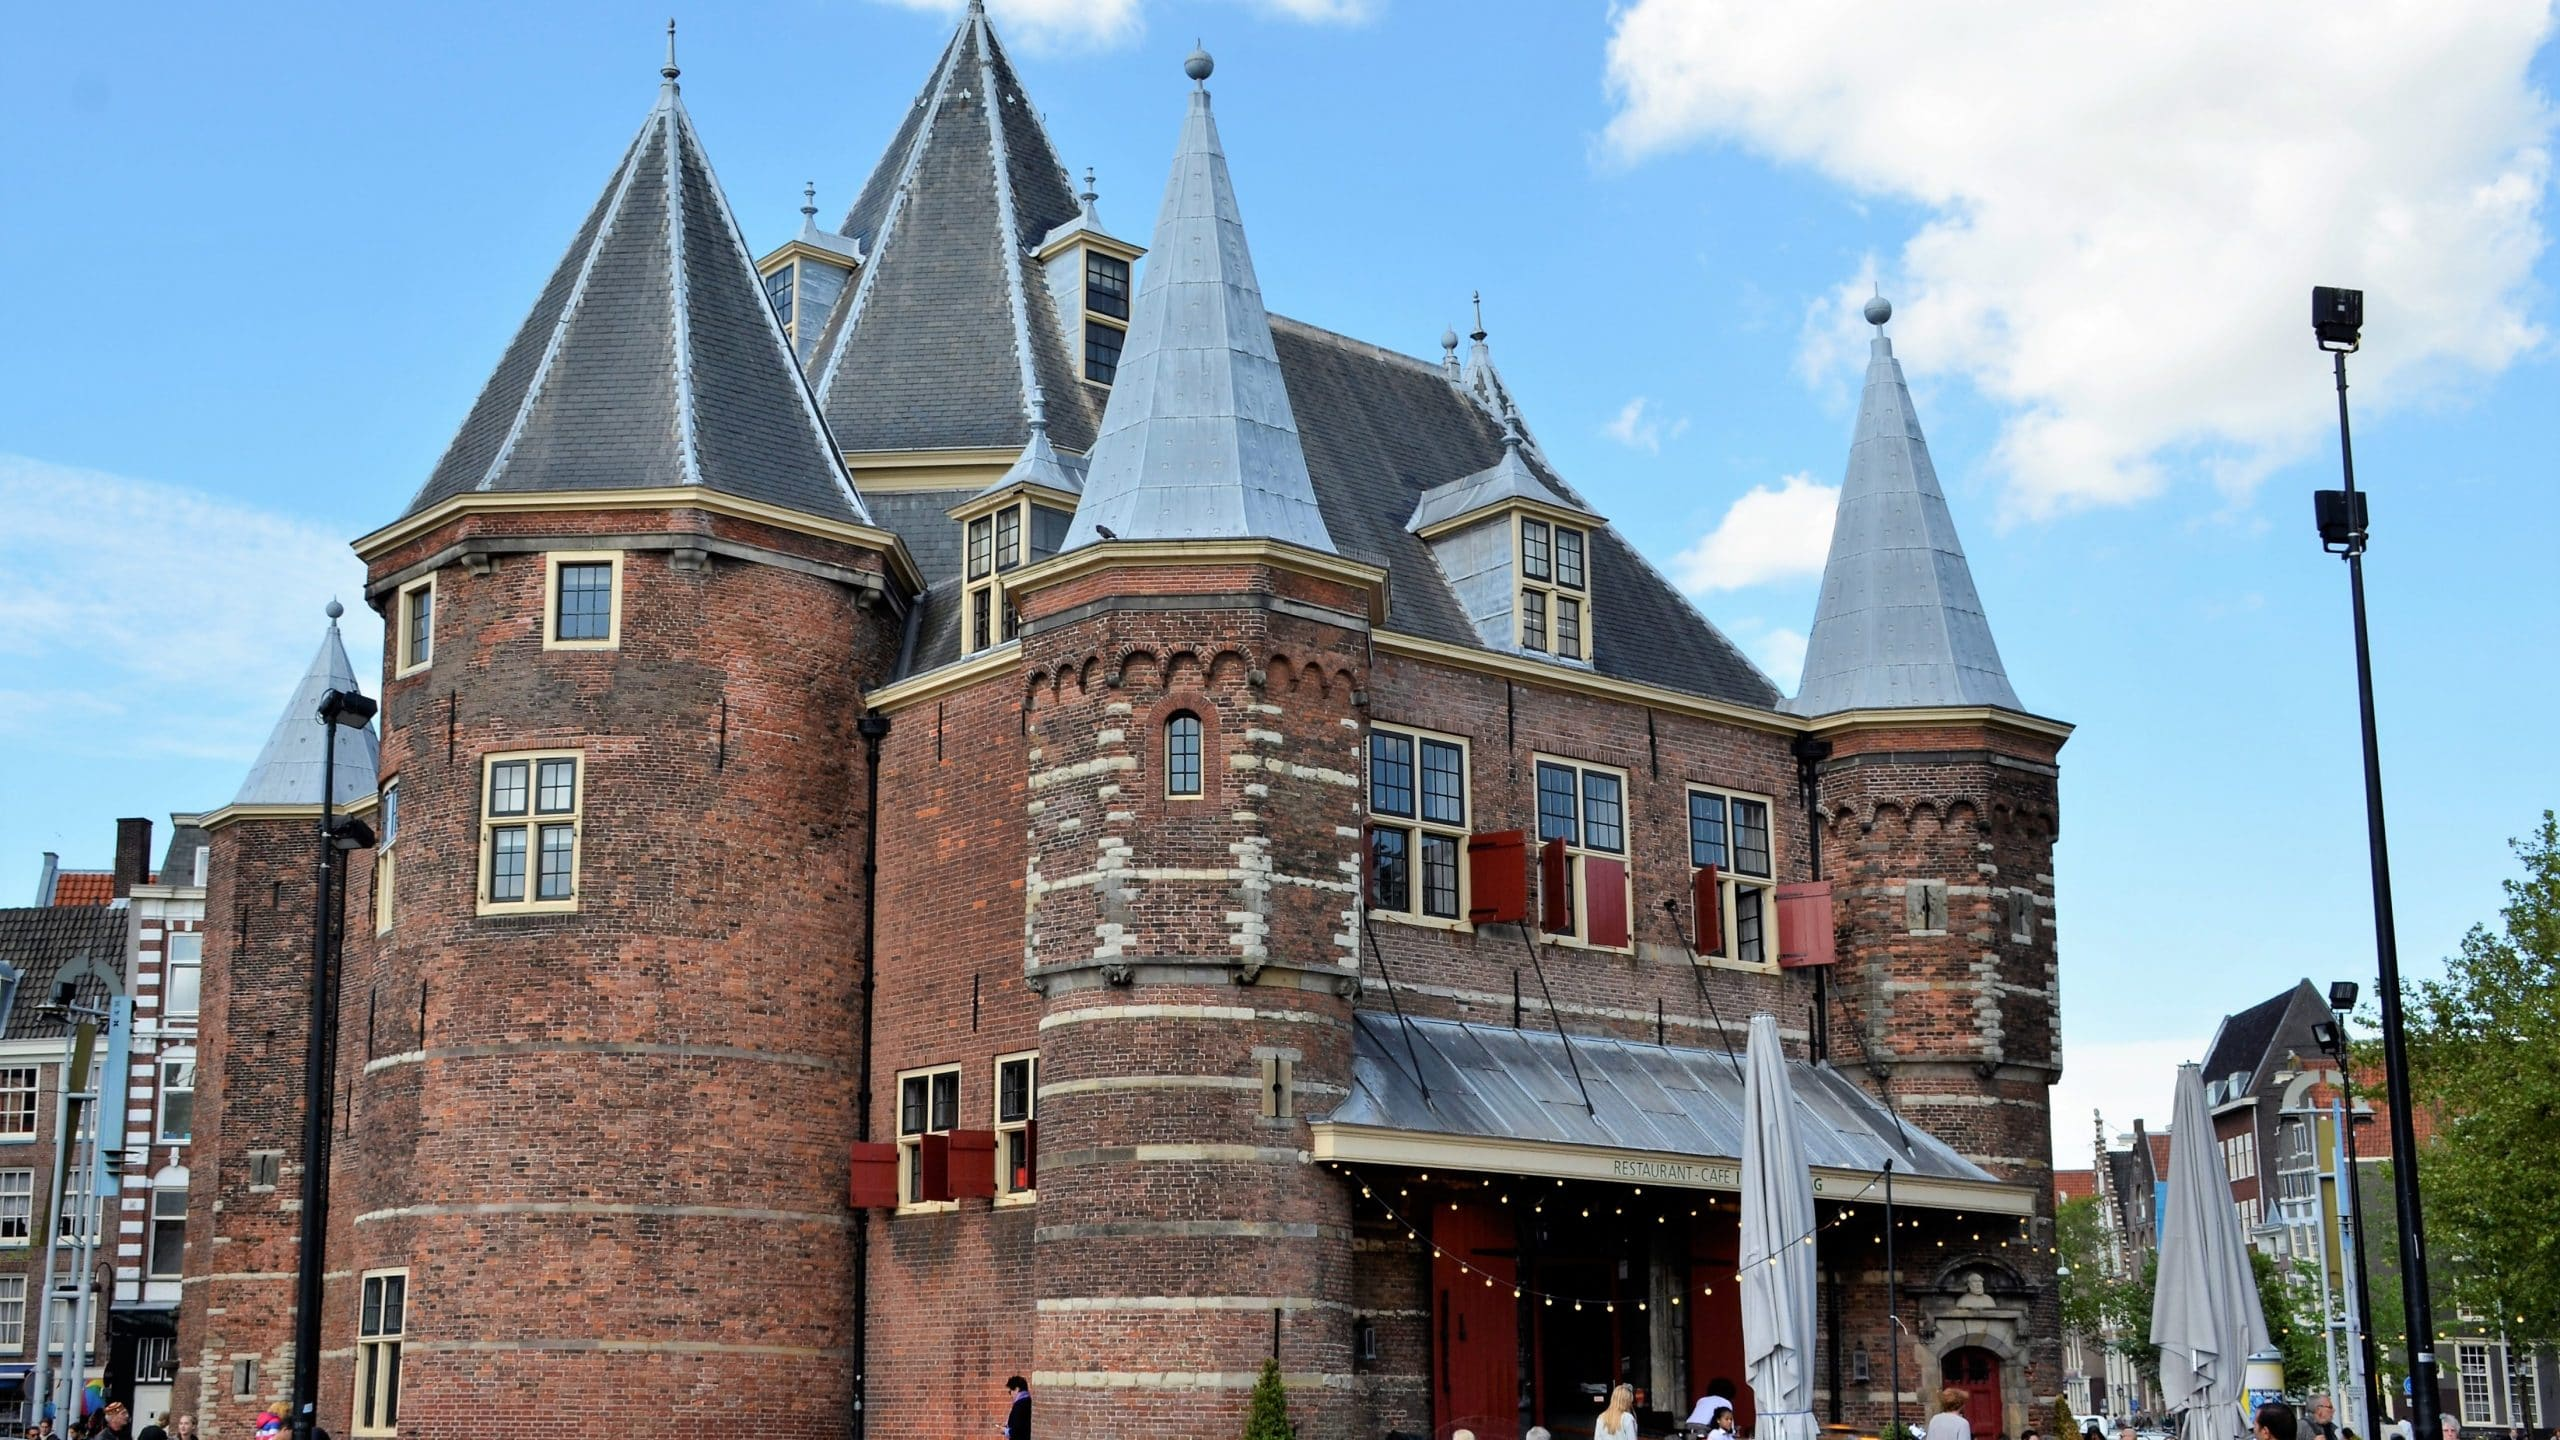 Waaggeboue Amsterdam